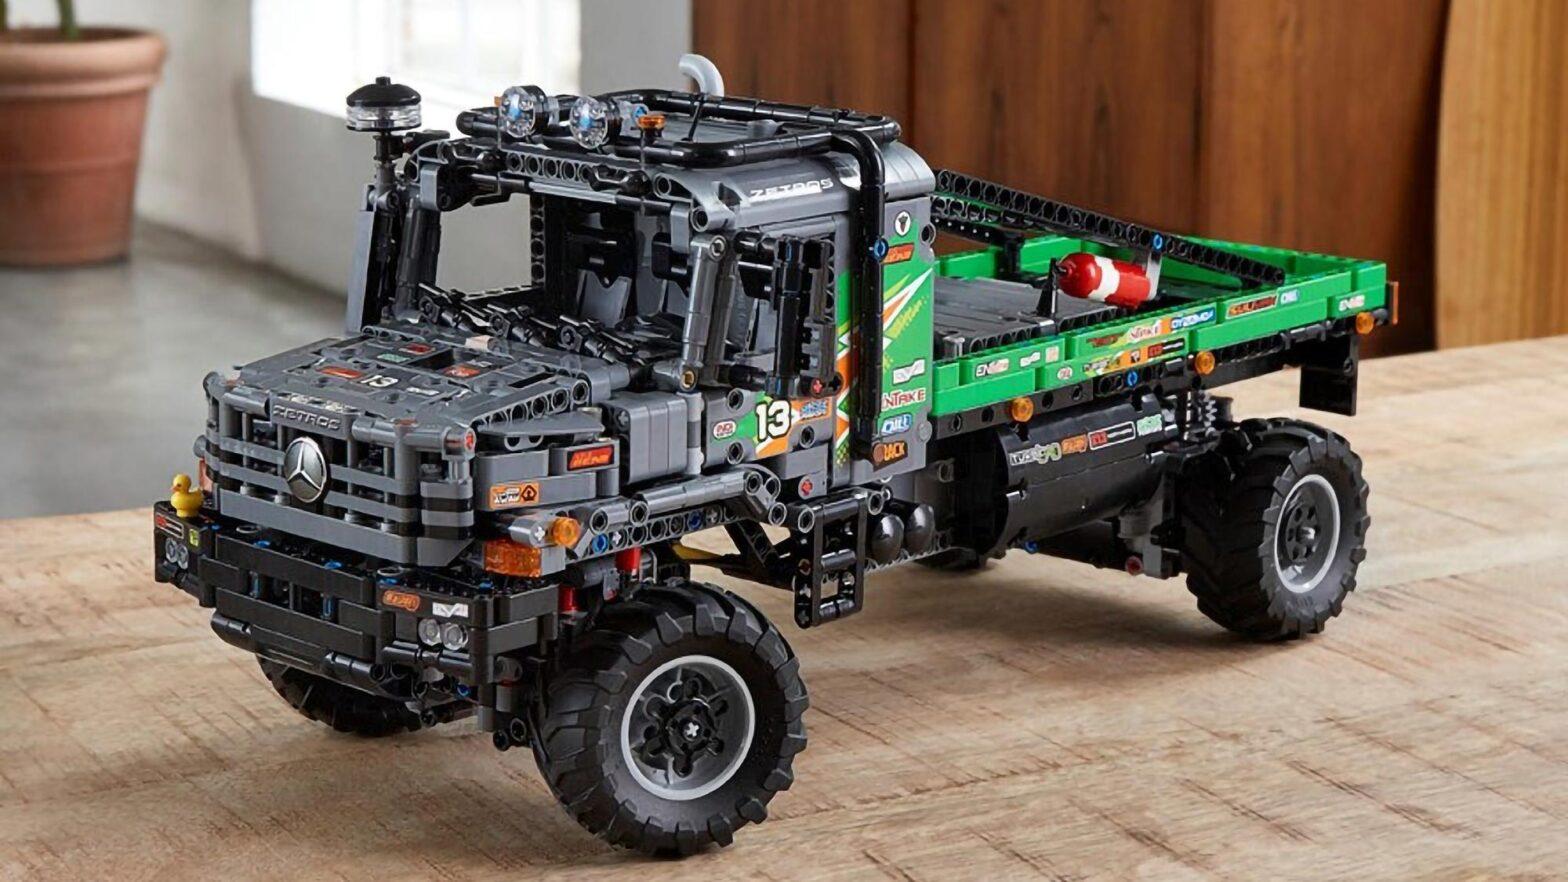 LEGO 42129 Technic 4x4 Mercedes-Benz Zetros Trial Truck